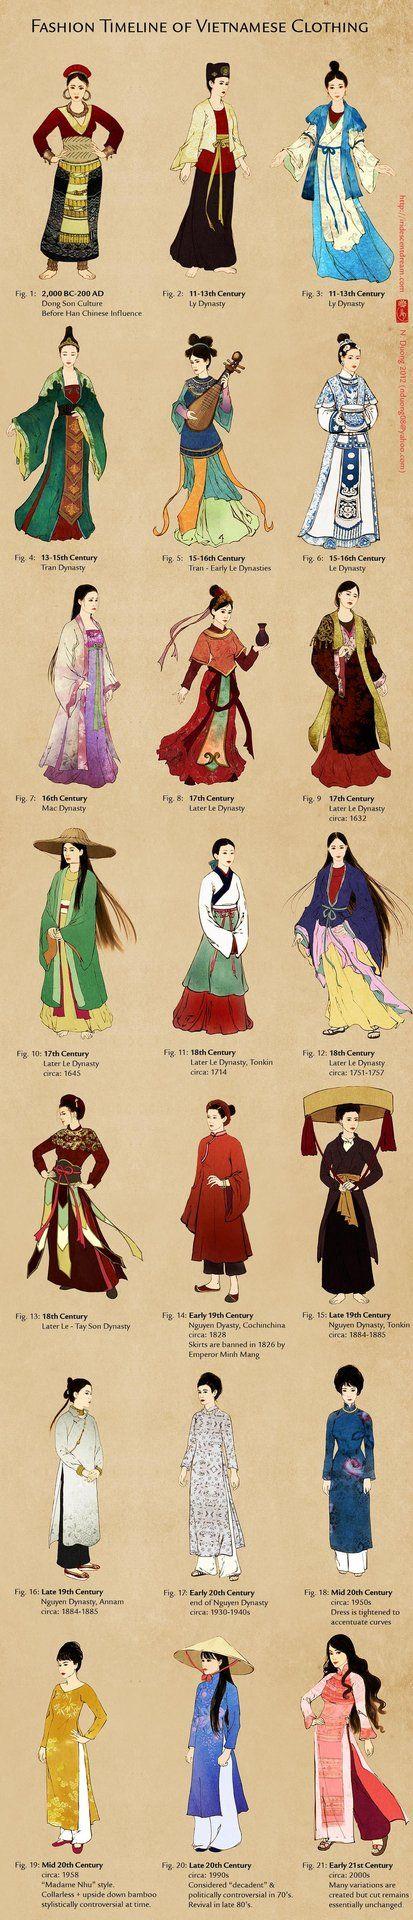 Fashion Timeline of Vietnamese Clothing on Non-Western Historical fashion blog